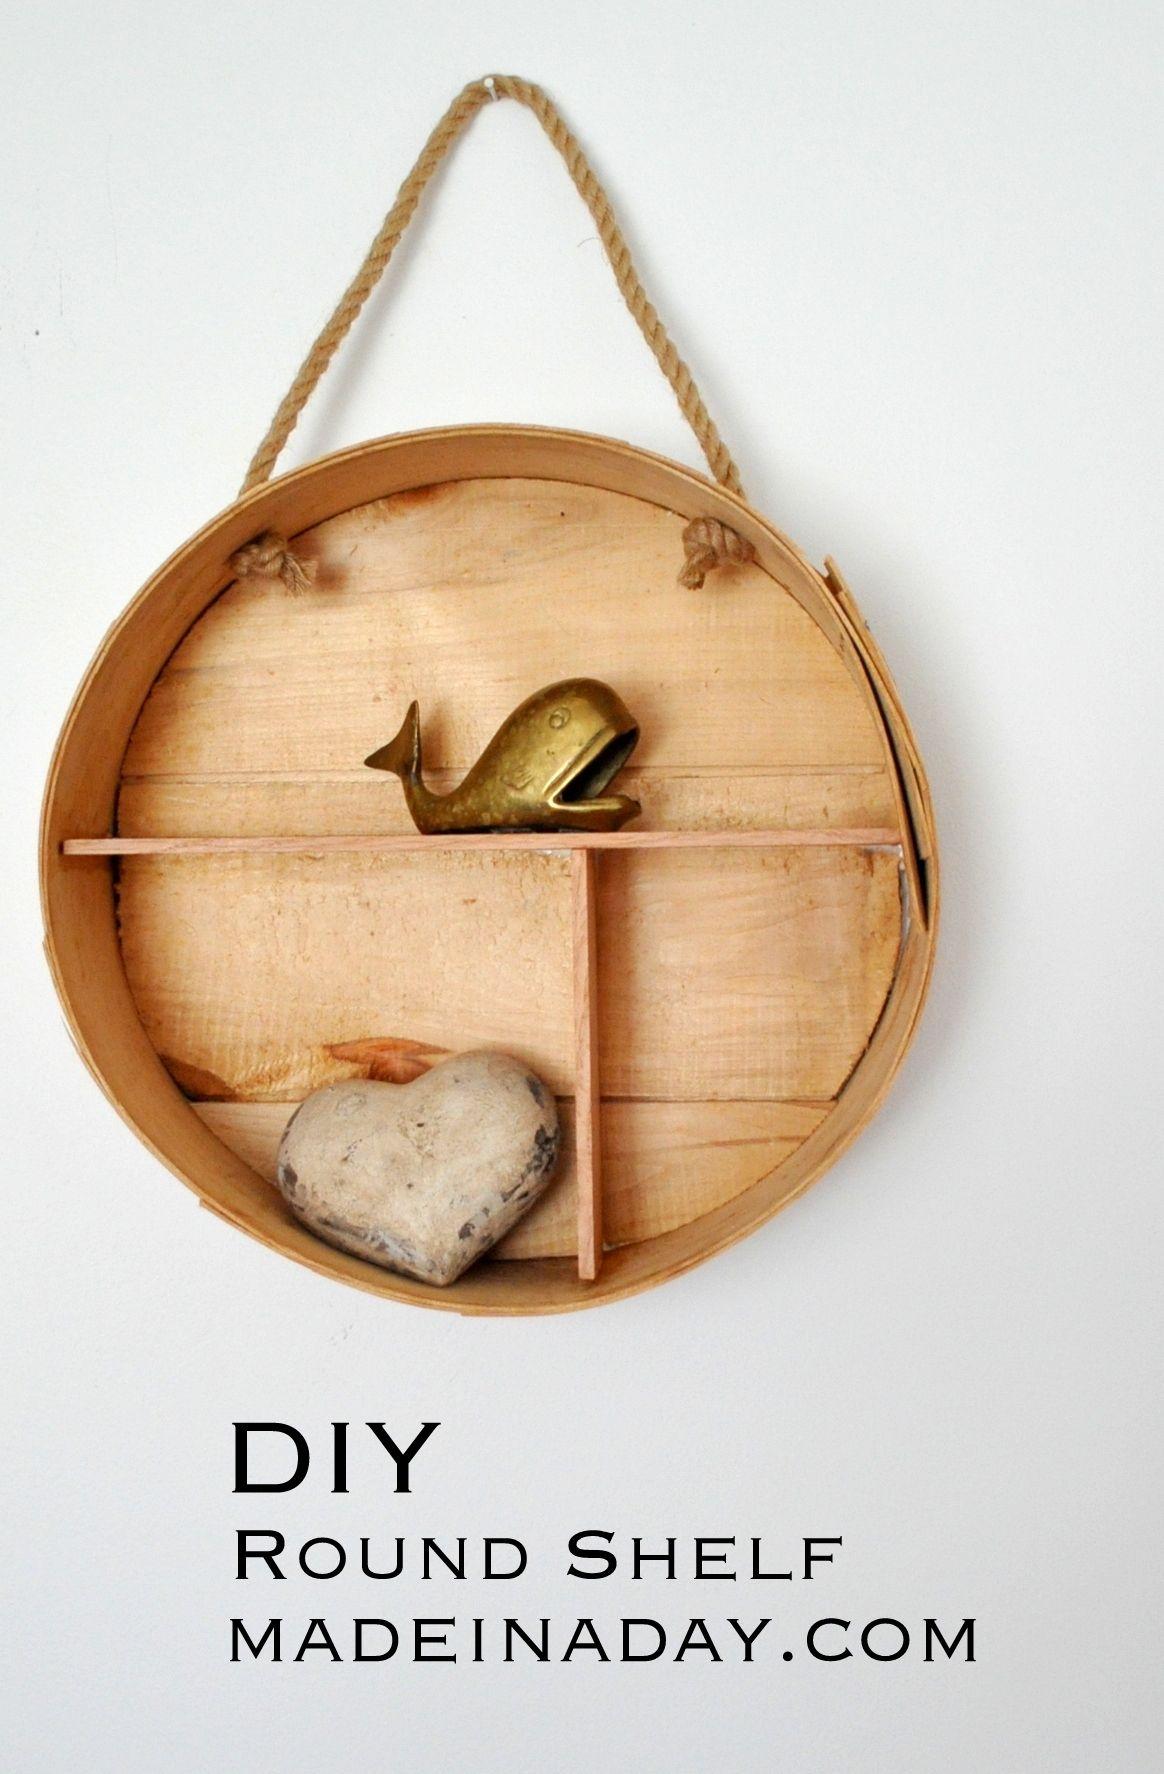 DIY Round Shelf from a Cheese Box, trendy round shelf, cheese box ...